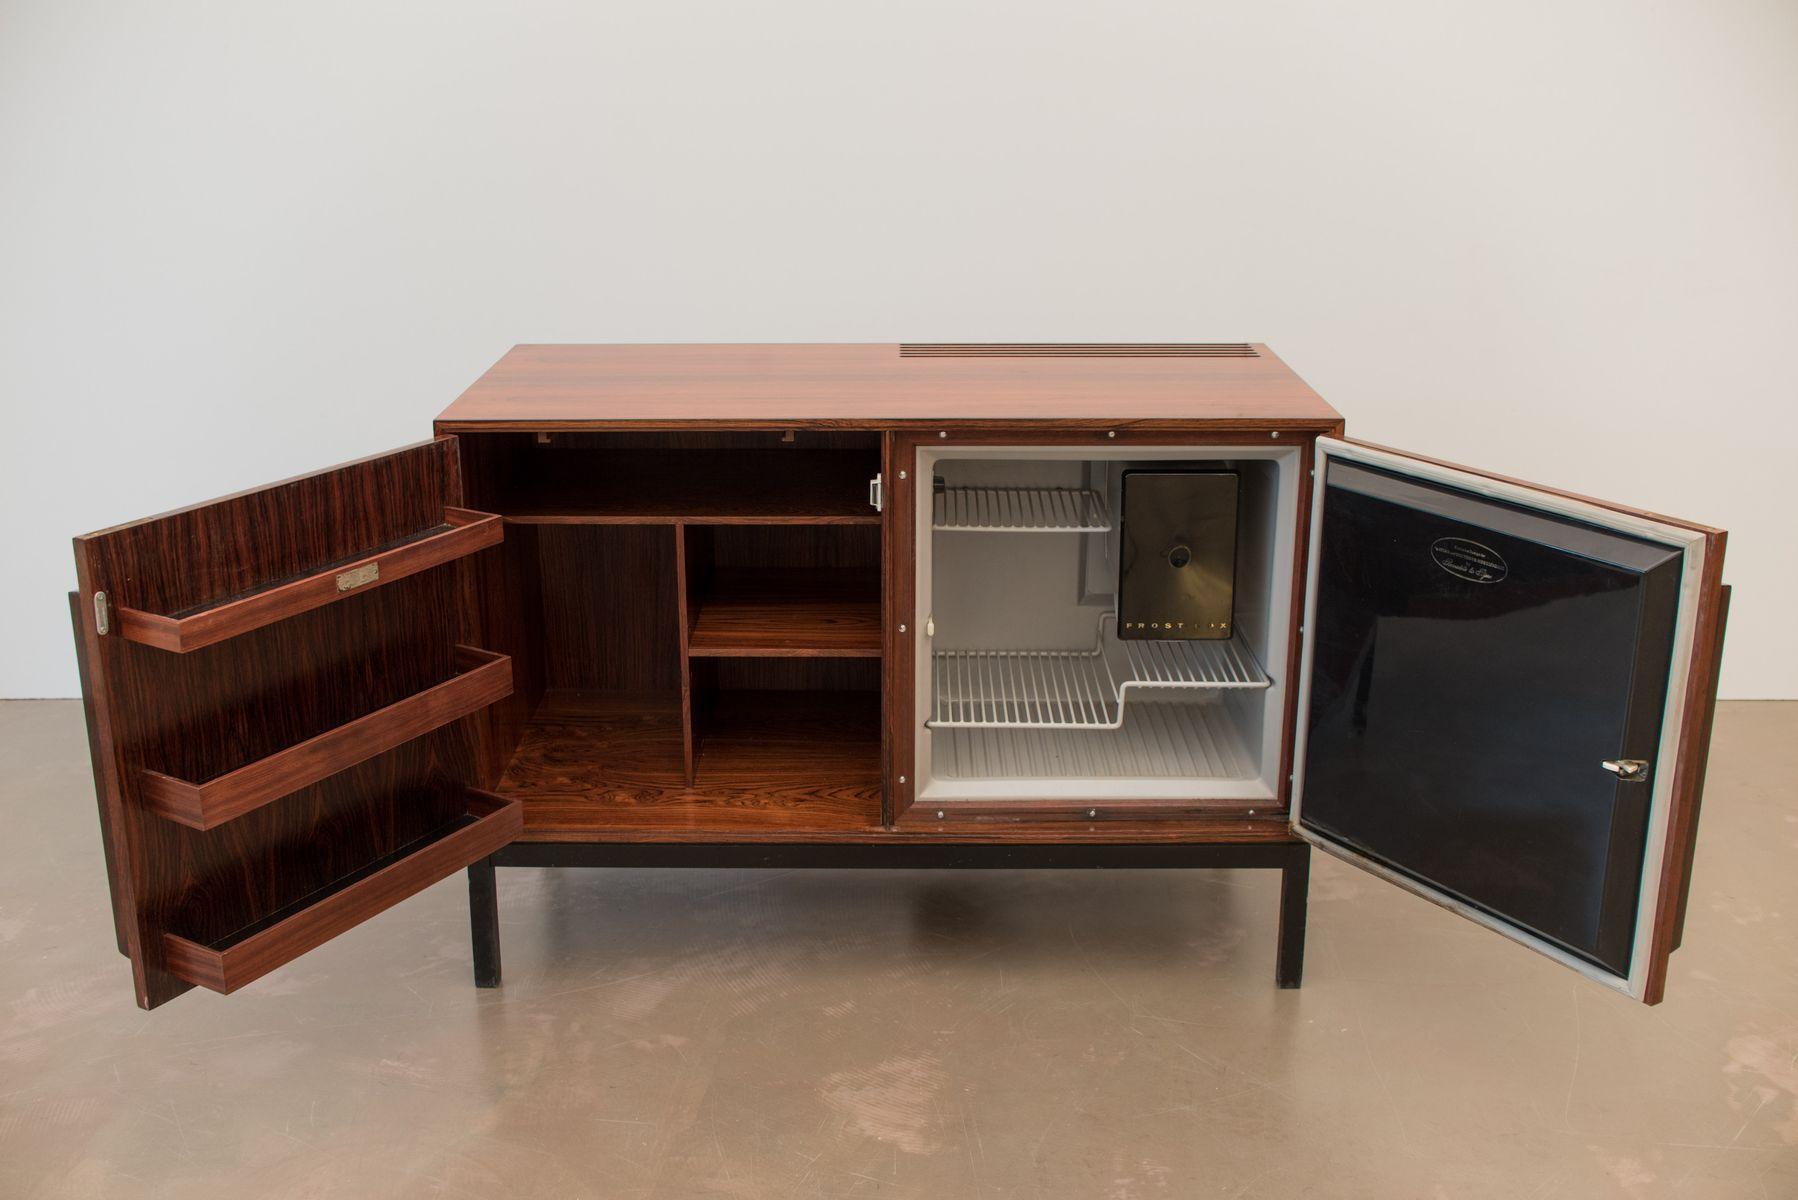 Asombroso Otomana Circular Con Muebles De Almacenamiento Galería ...